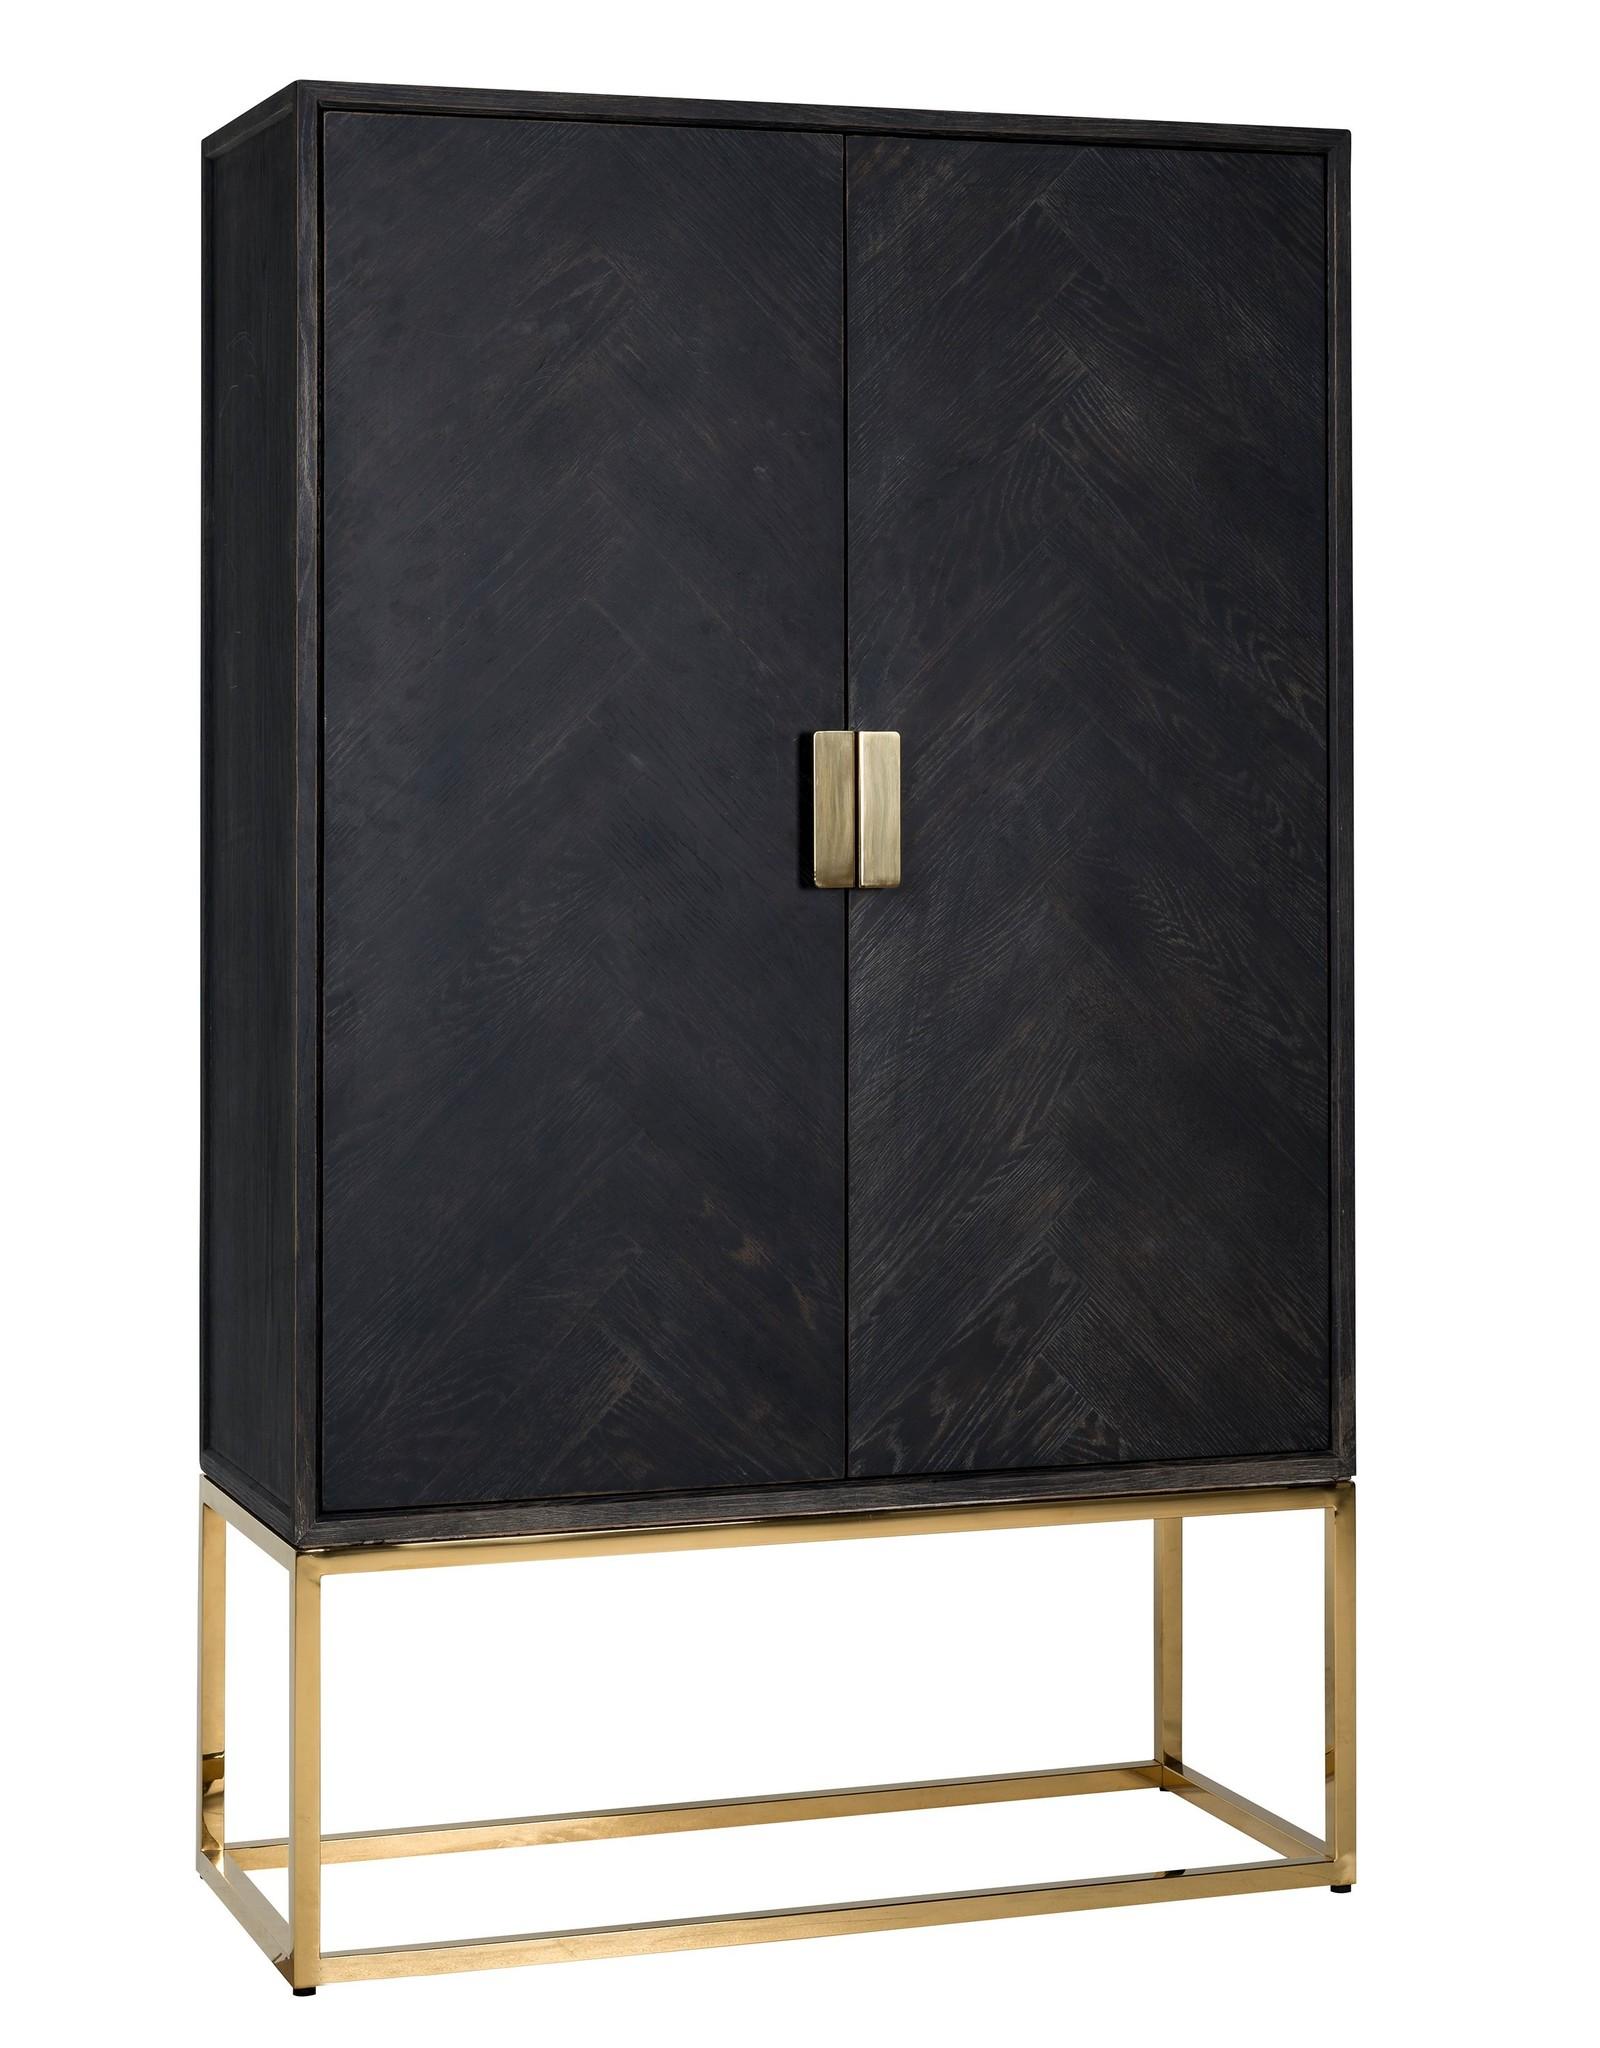 Richmond Interiors Wandkast Blackbone gold 2-deuren laag